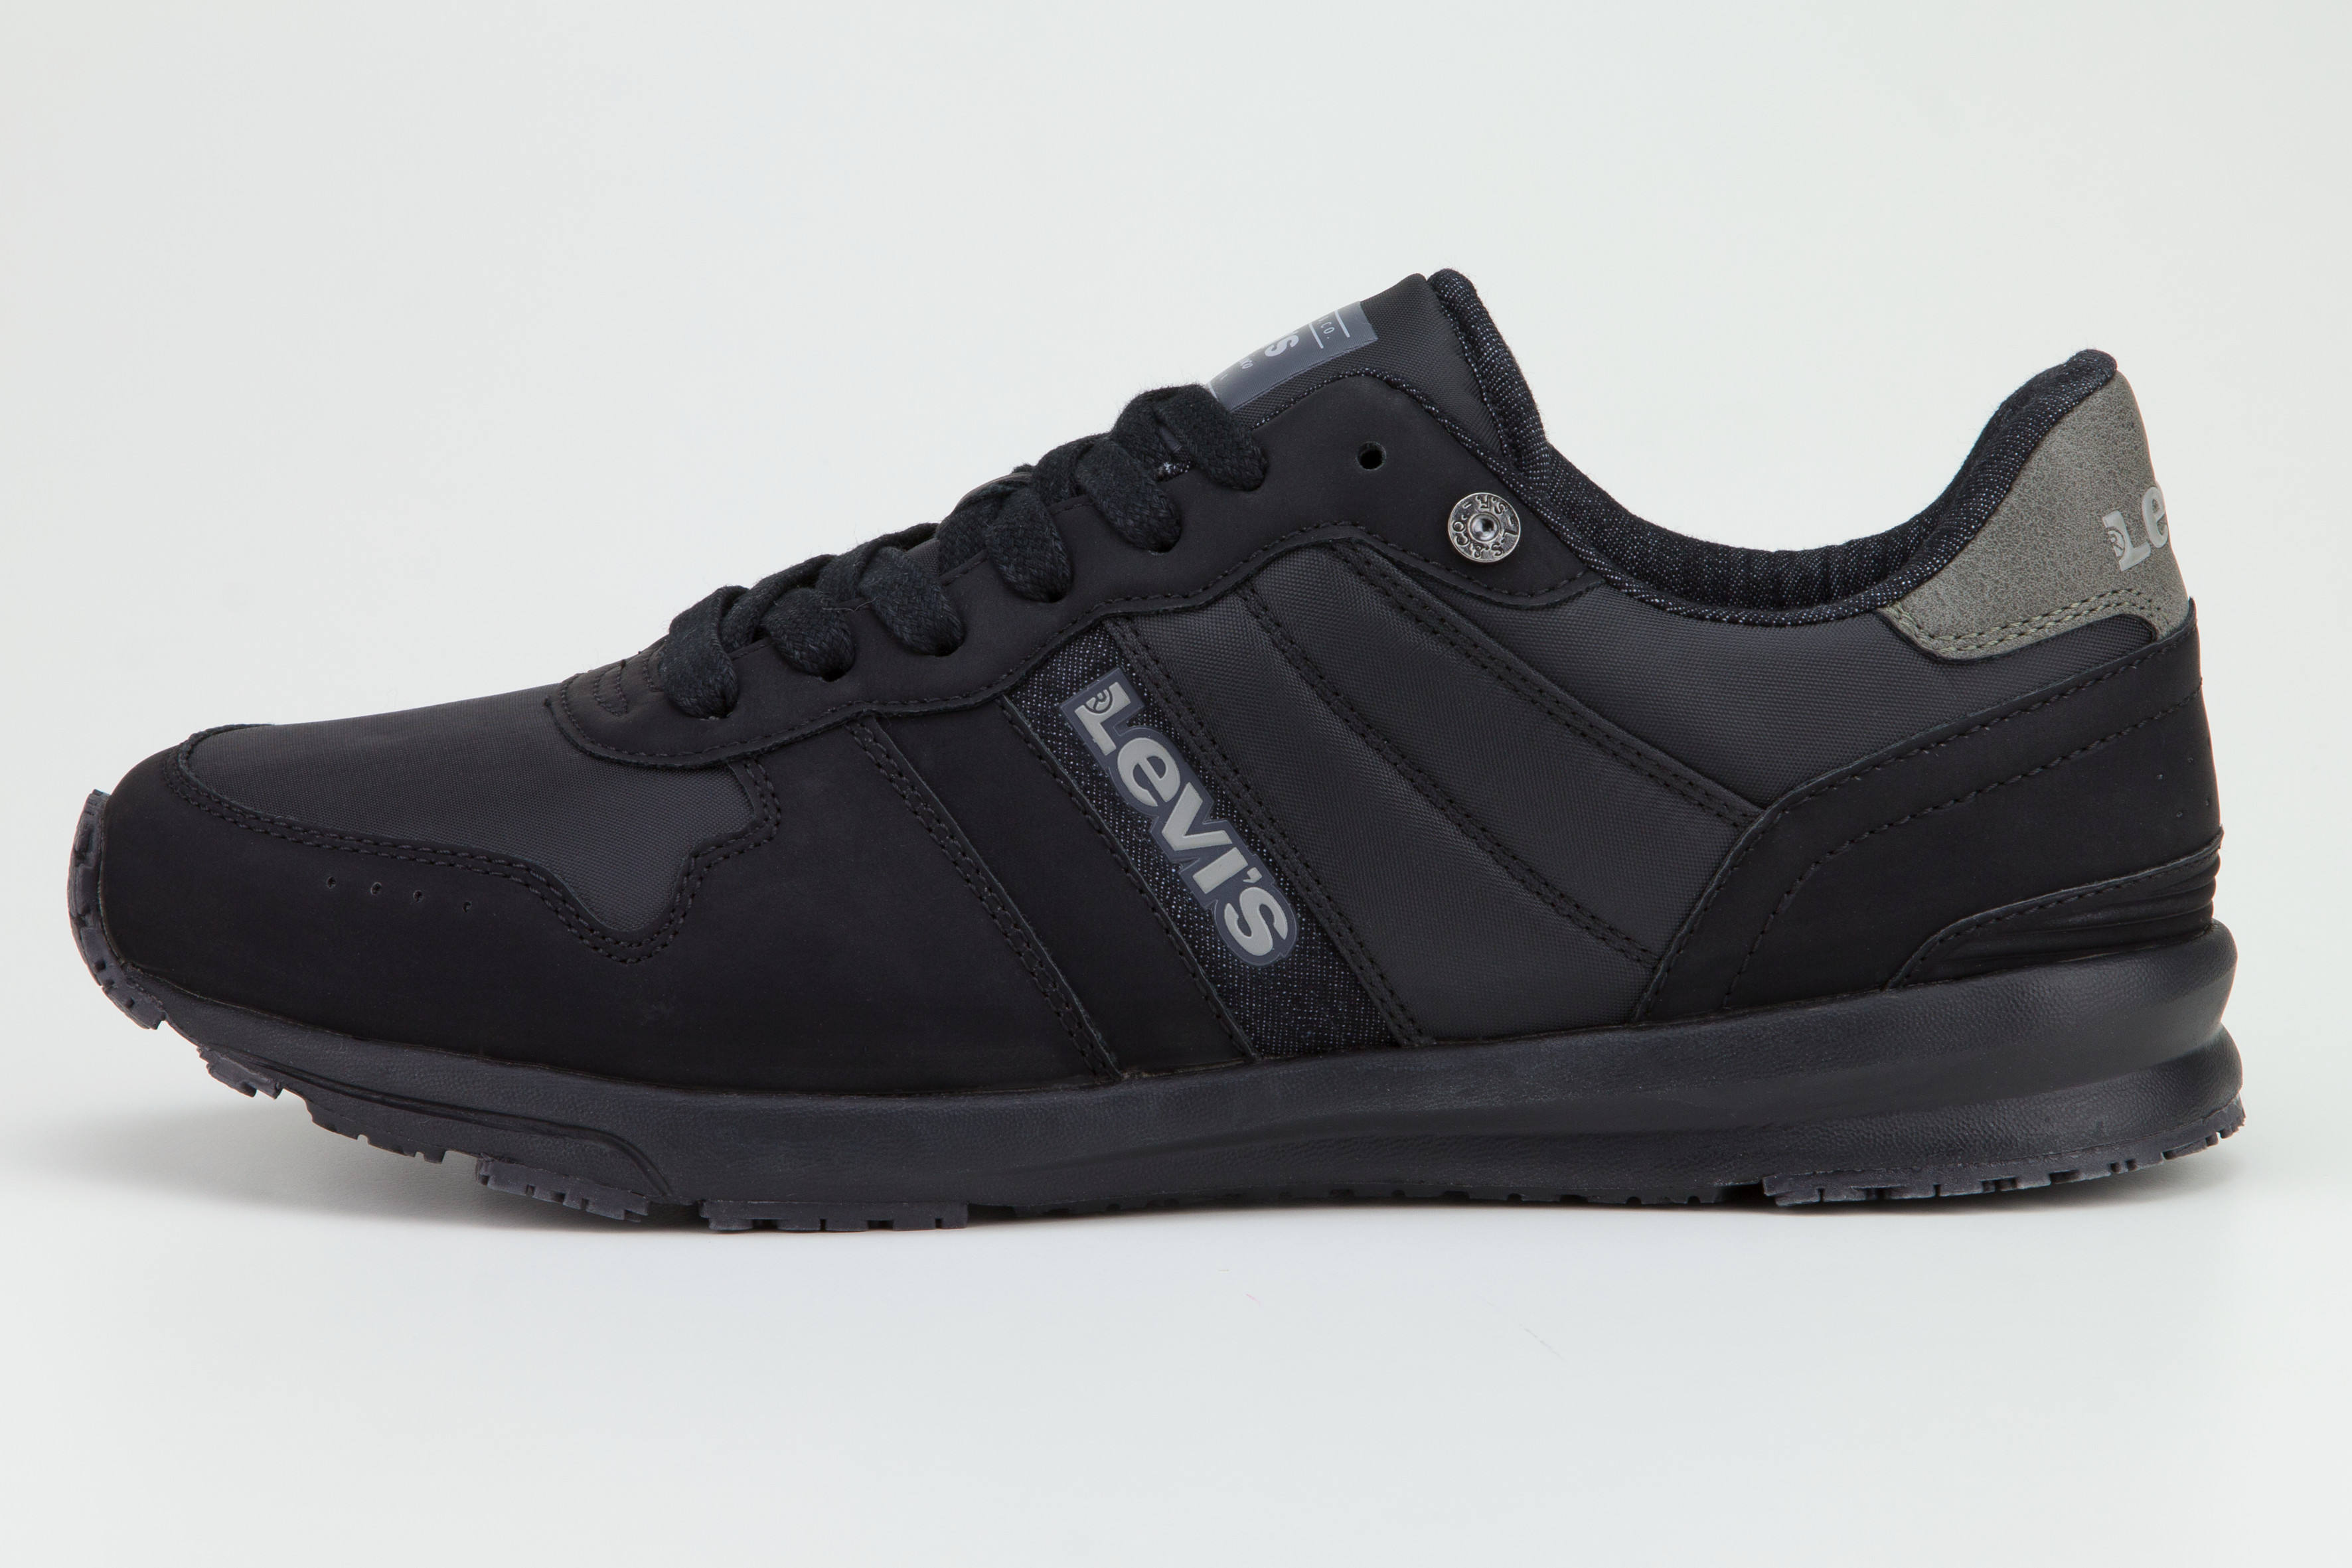 Levis Schuhe Sneaker BAYLOR 227240 1920 60 schwarz SH18-LS1